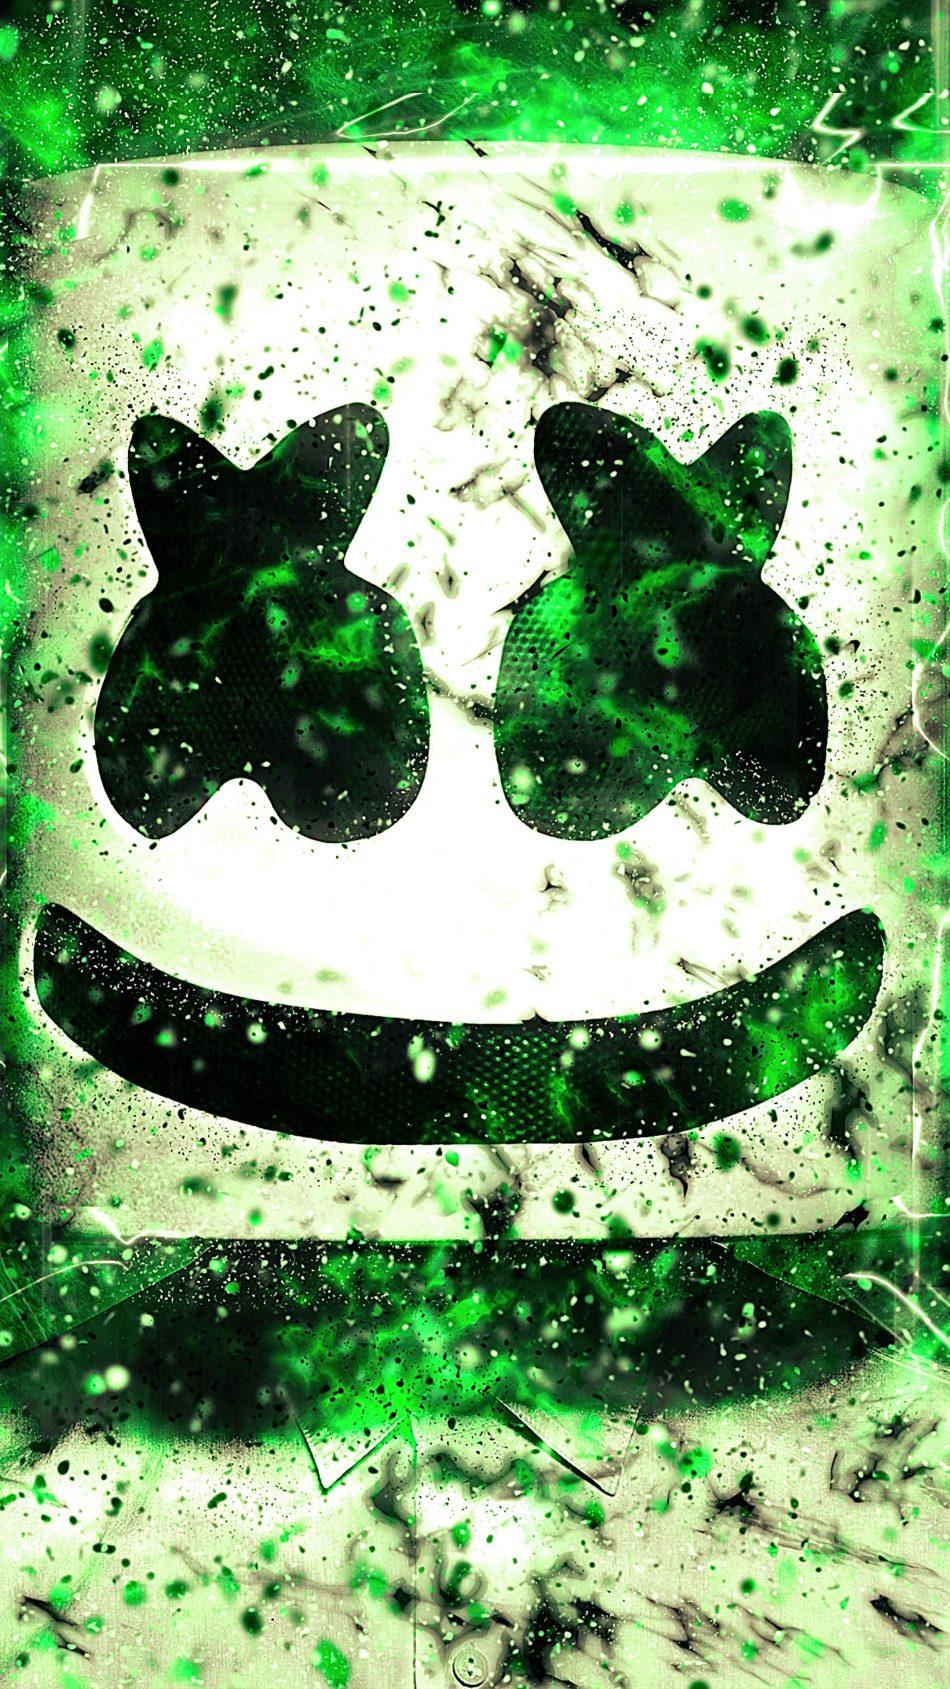 Download marshmello green neon artwork free pure 4k ultra - Neon hd wallpaper for mobile ...